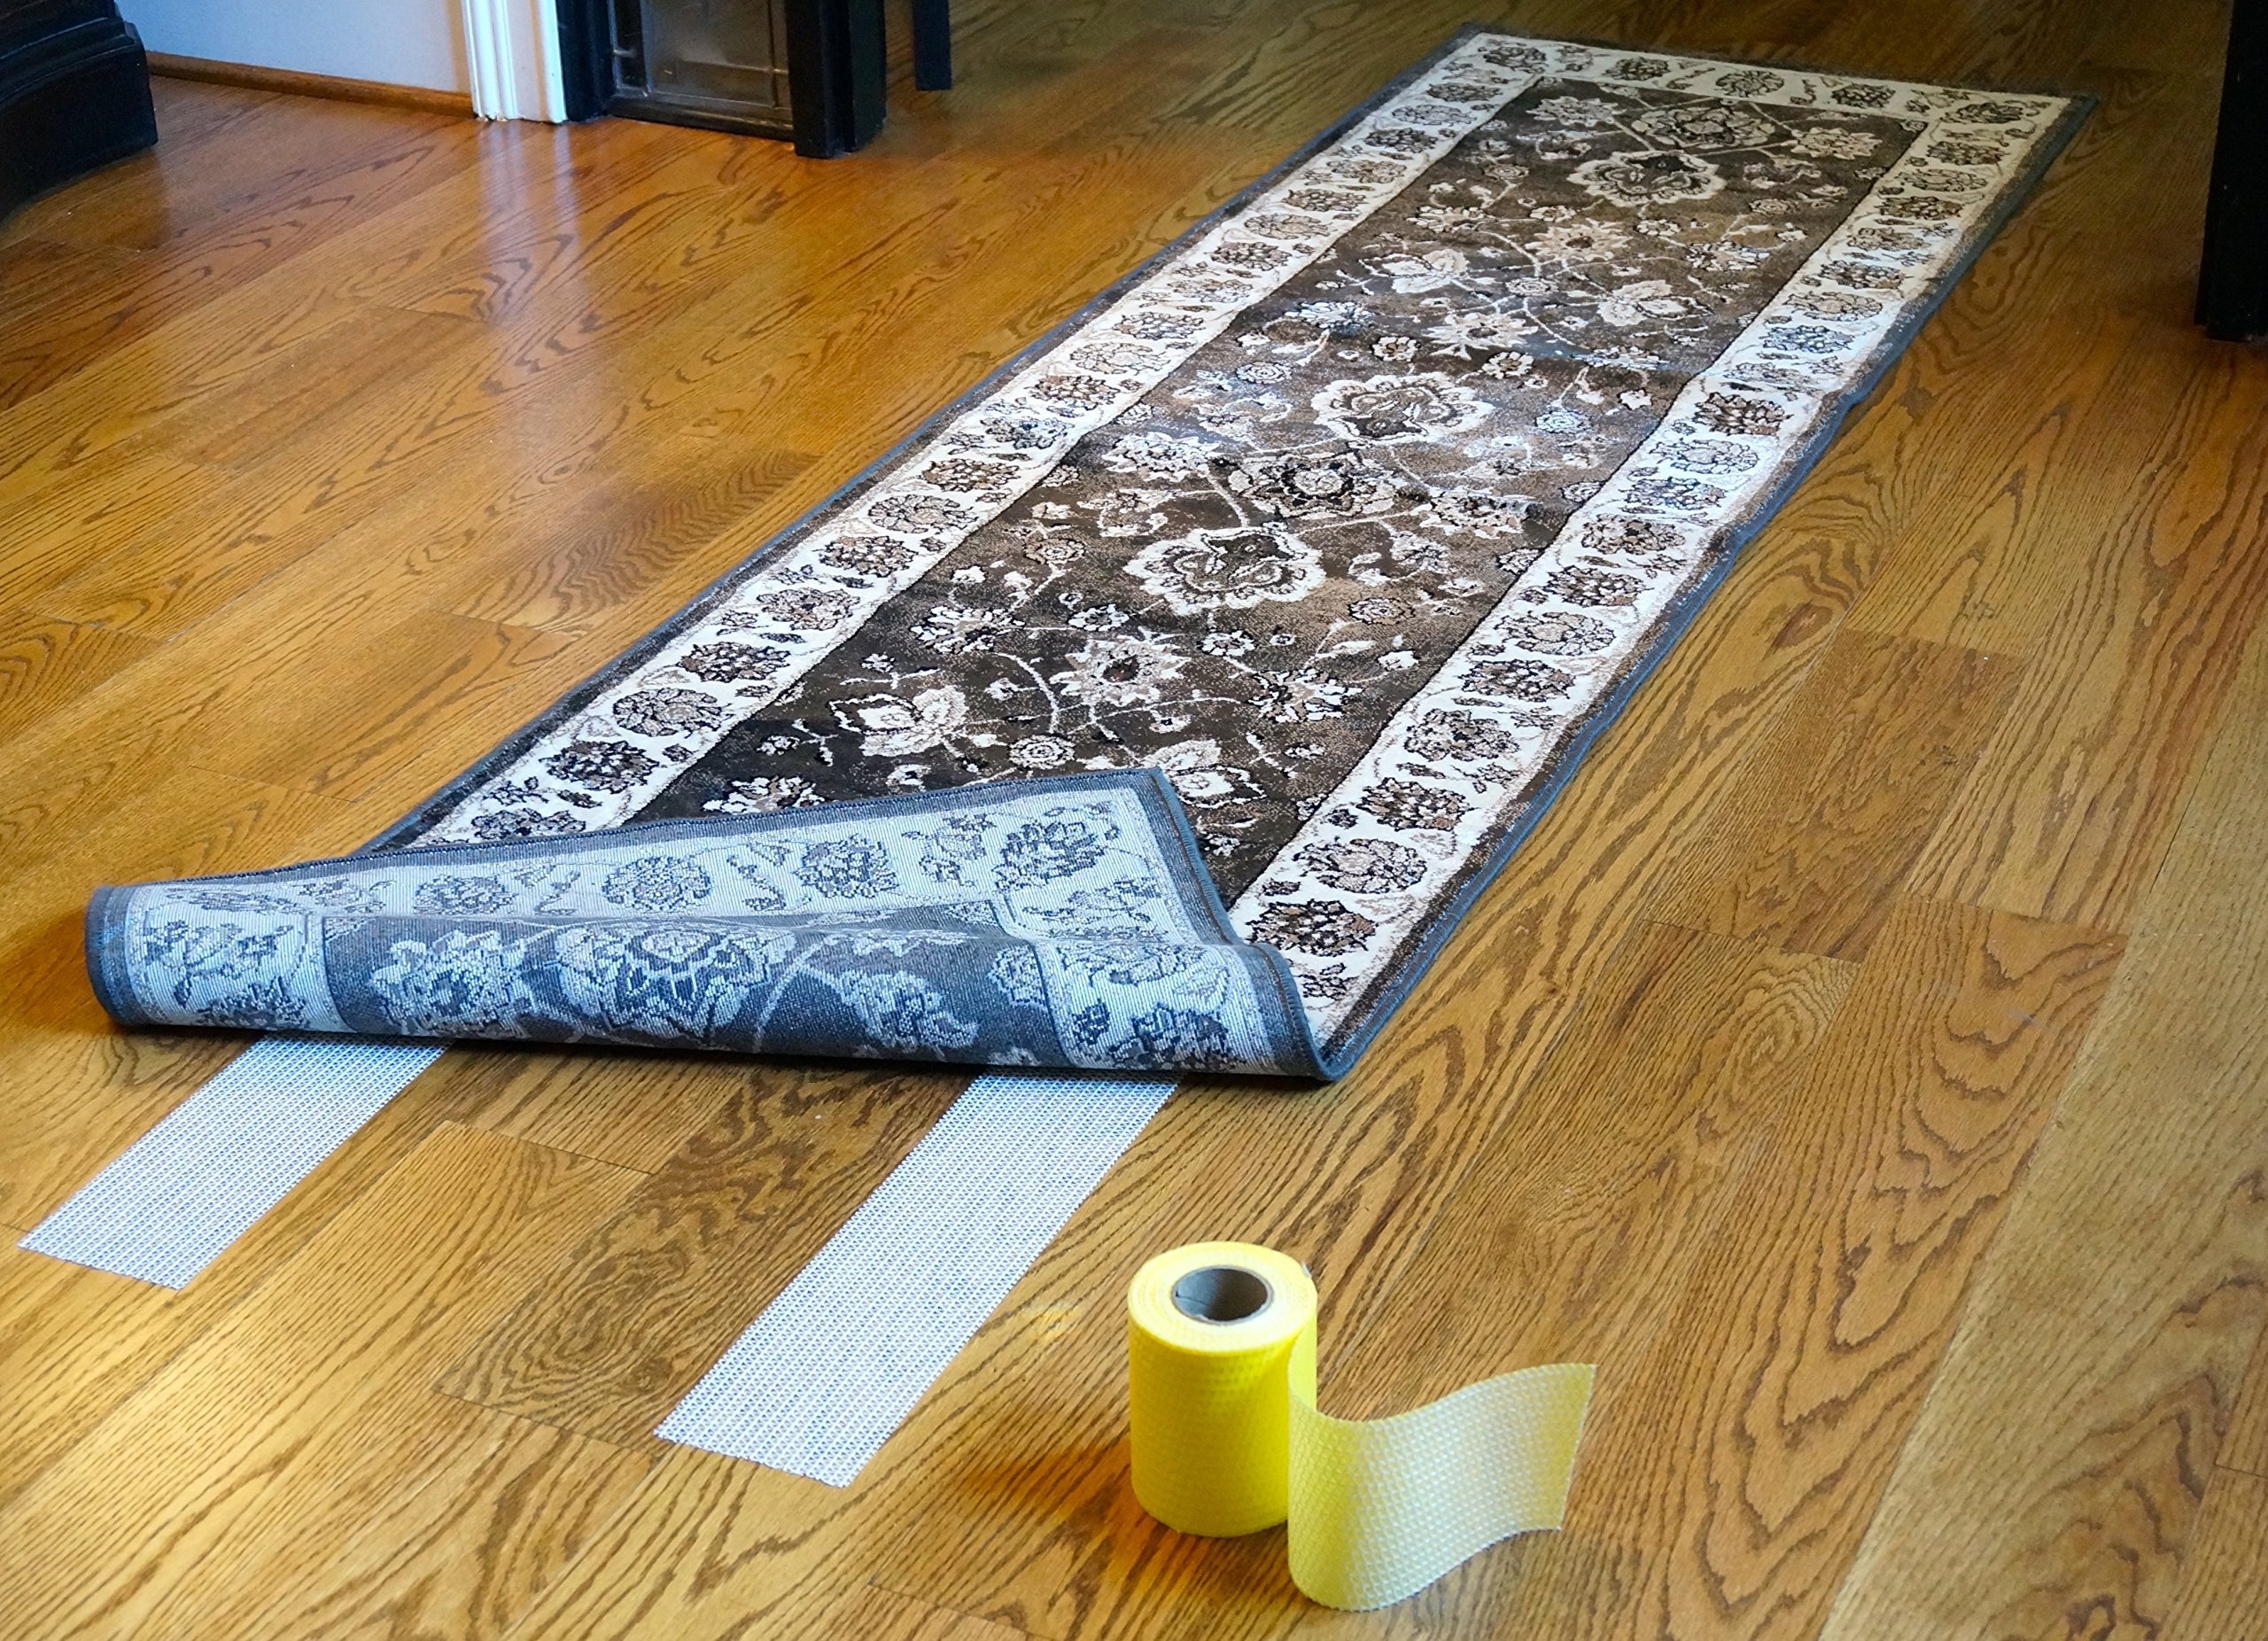 Optimum Technologies Lok Lift Rug Gripper for Runners, 4 Inch by 25 Feet. The original slip resistant rug solution by Optimum Technologies